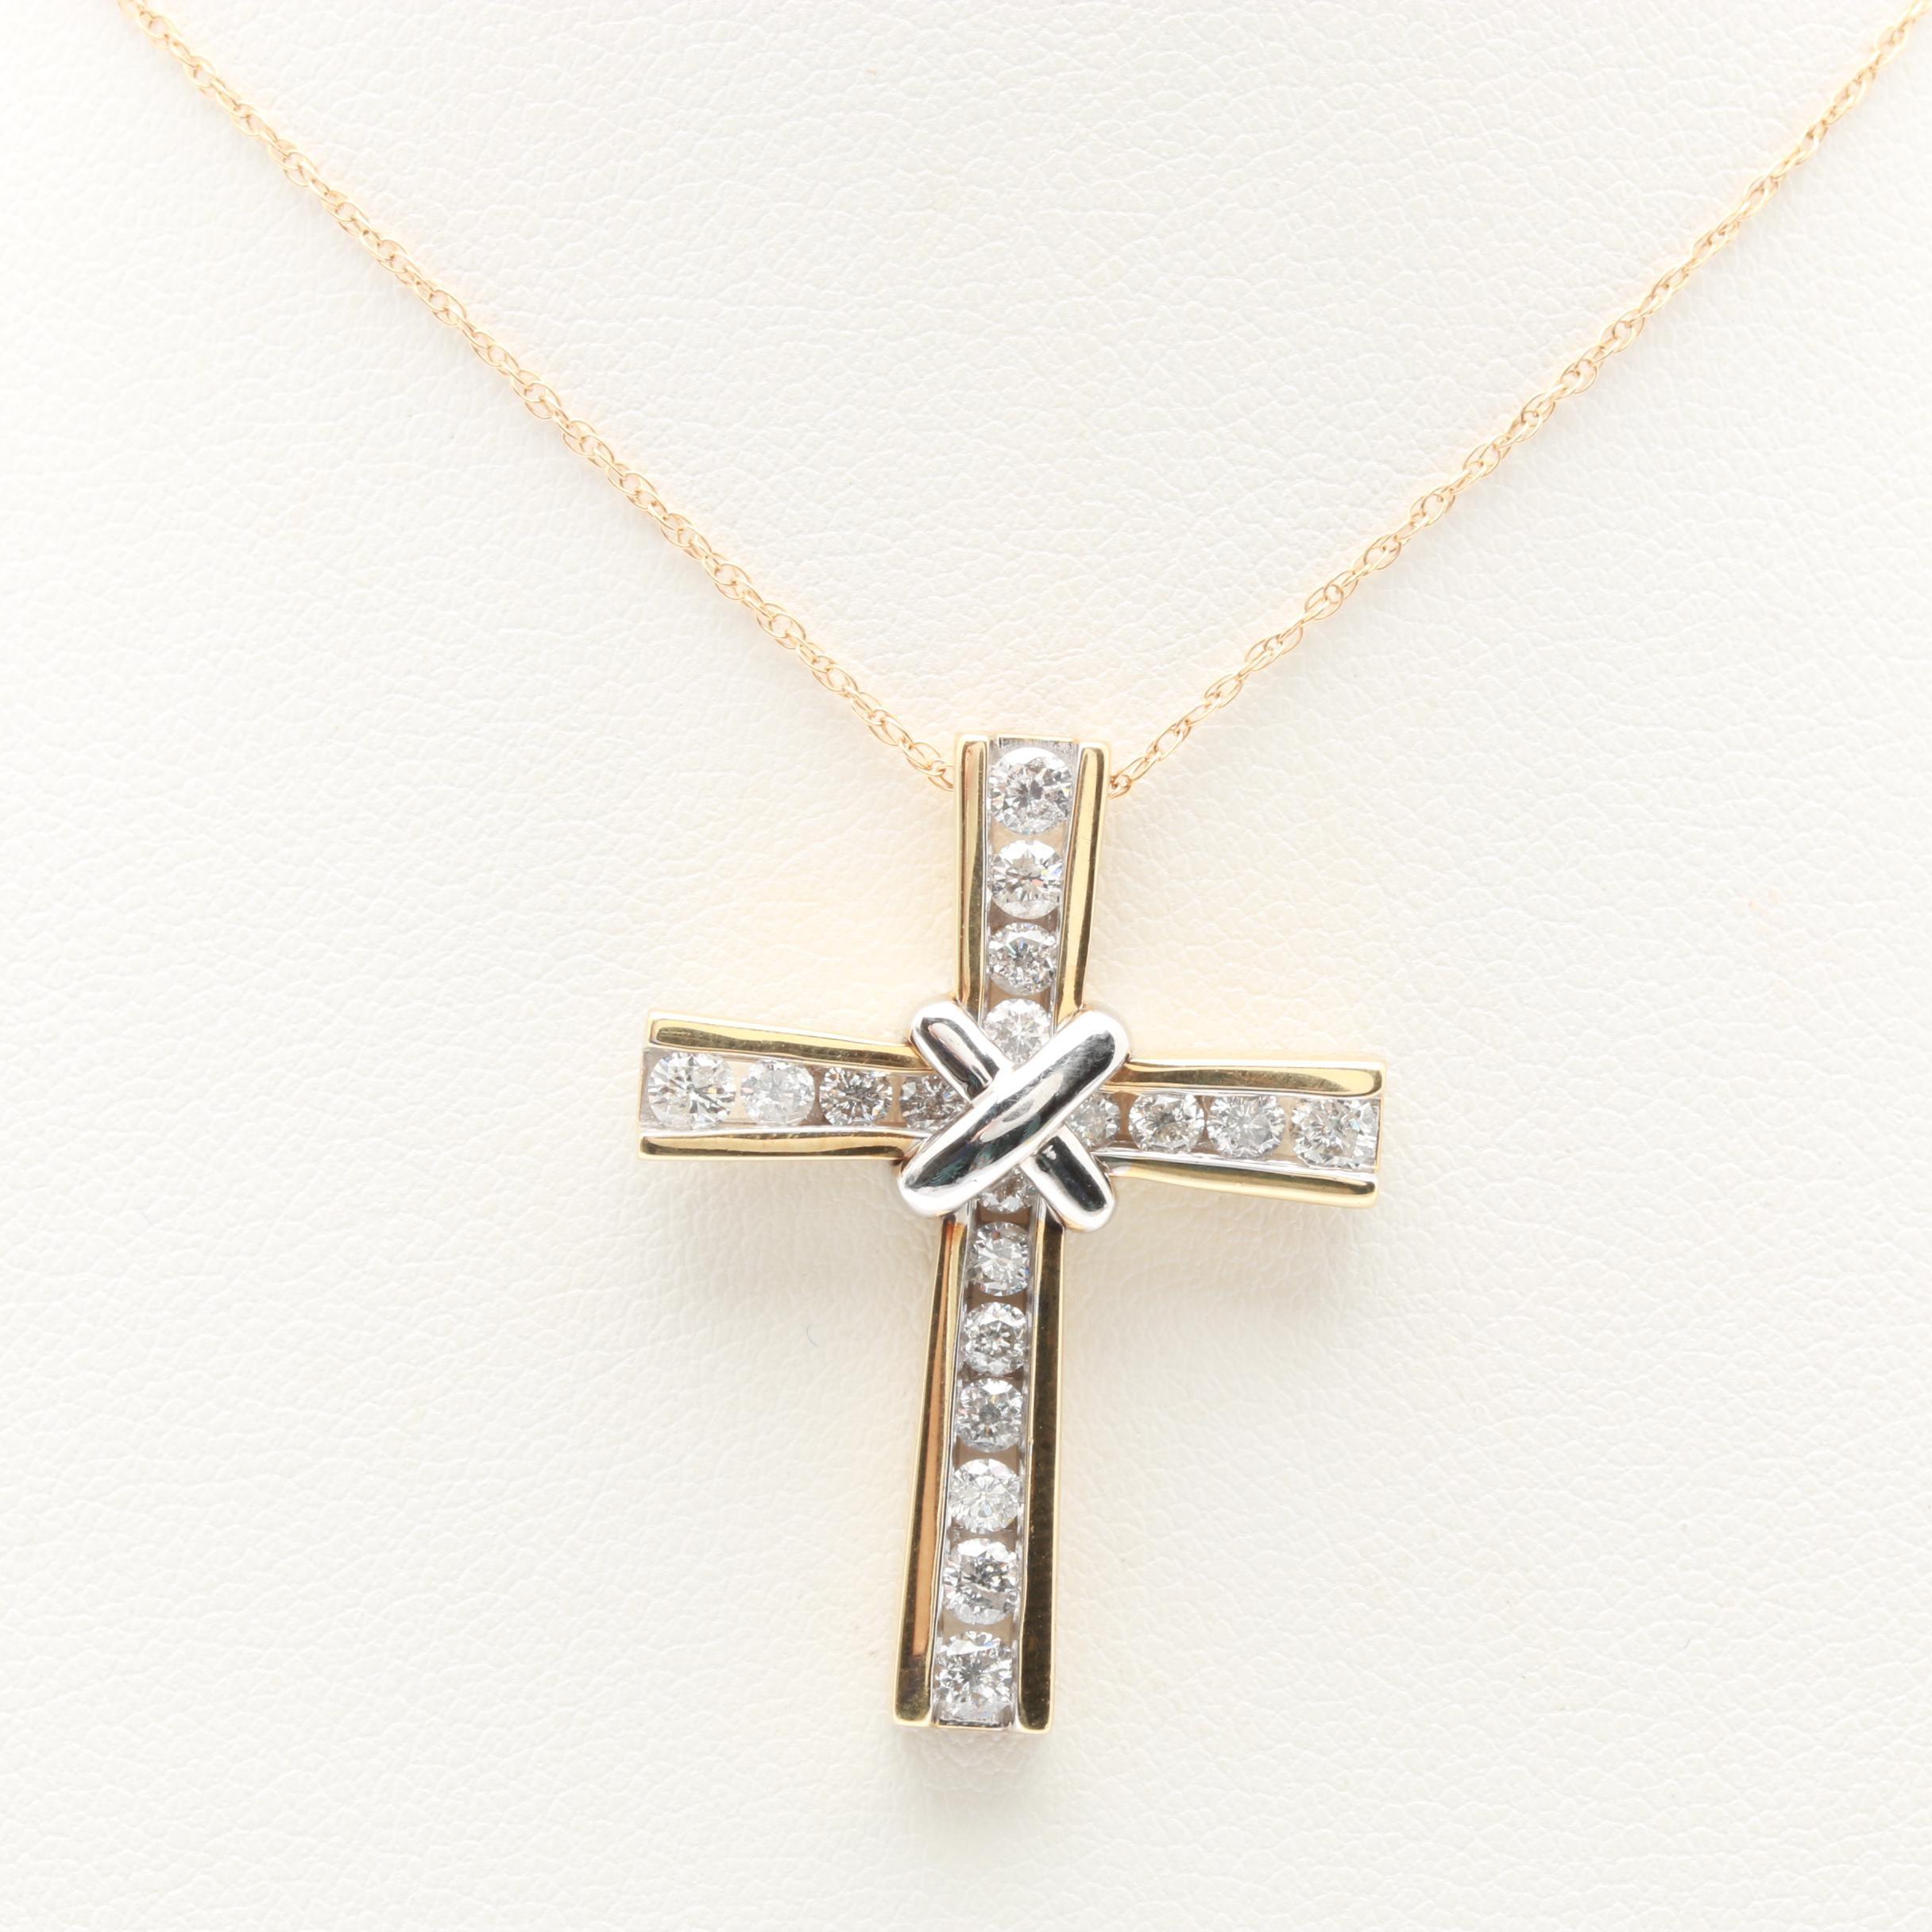 14K Yellow Gold 1.48 CTW Diamond Cross Pendant